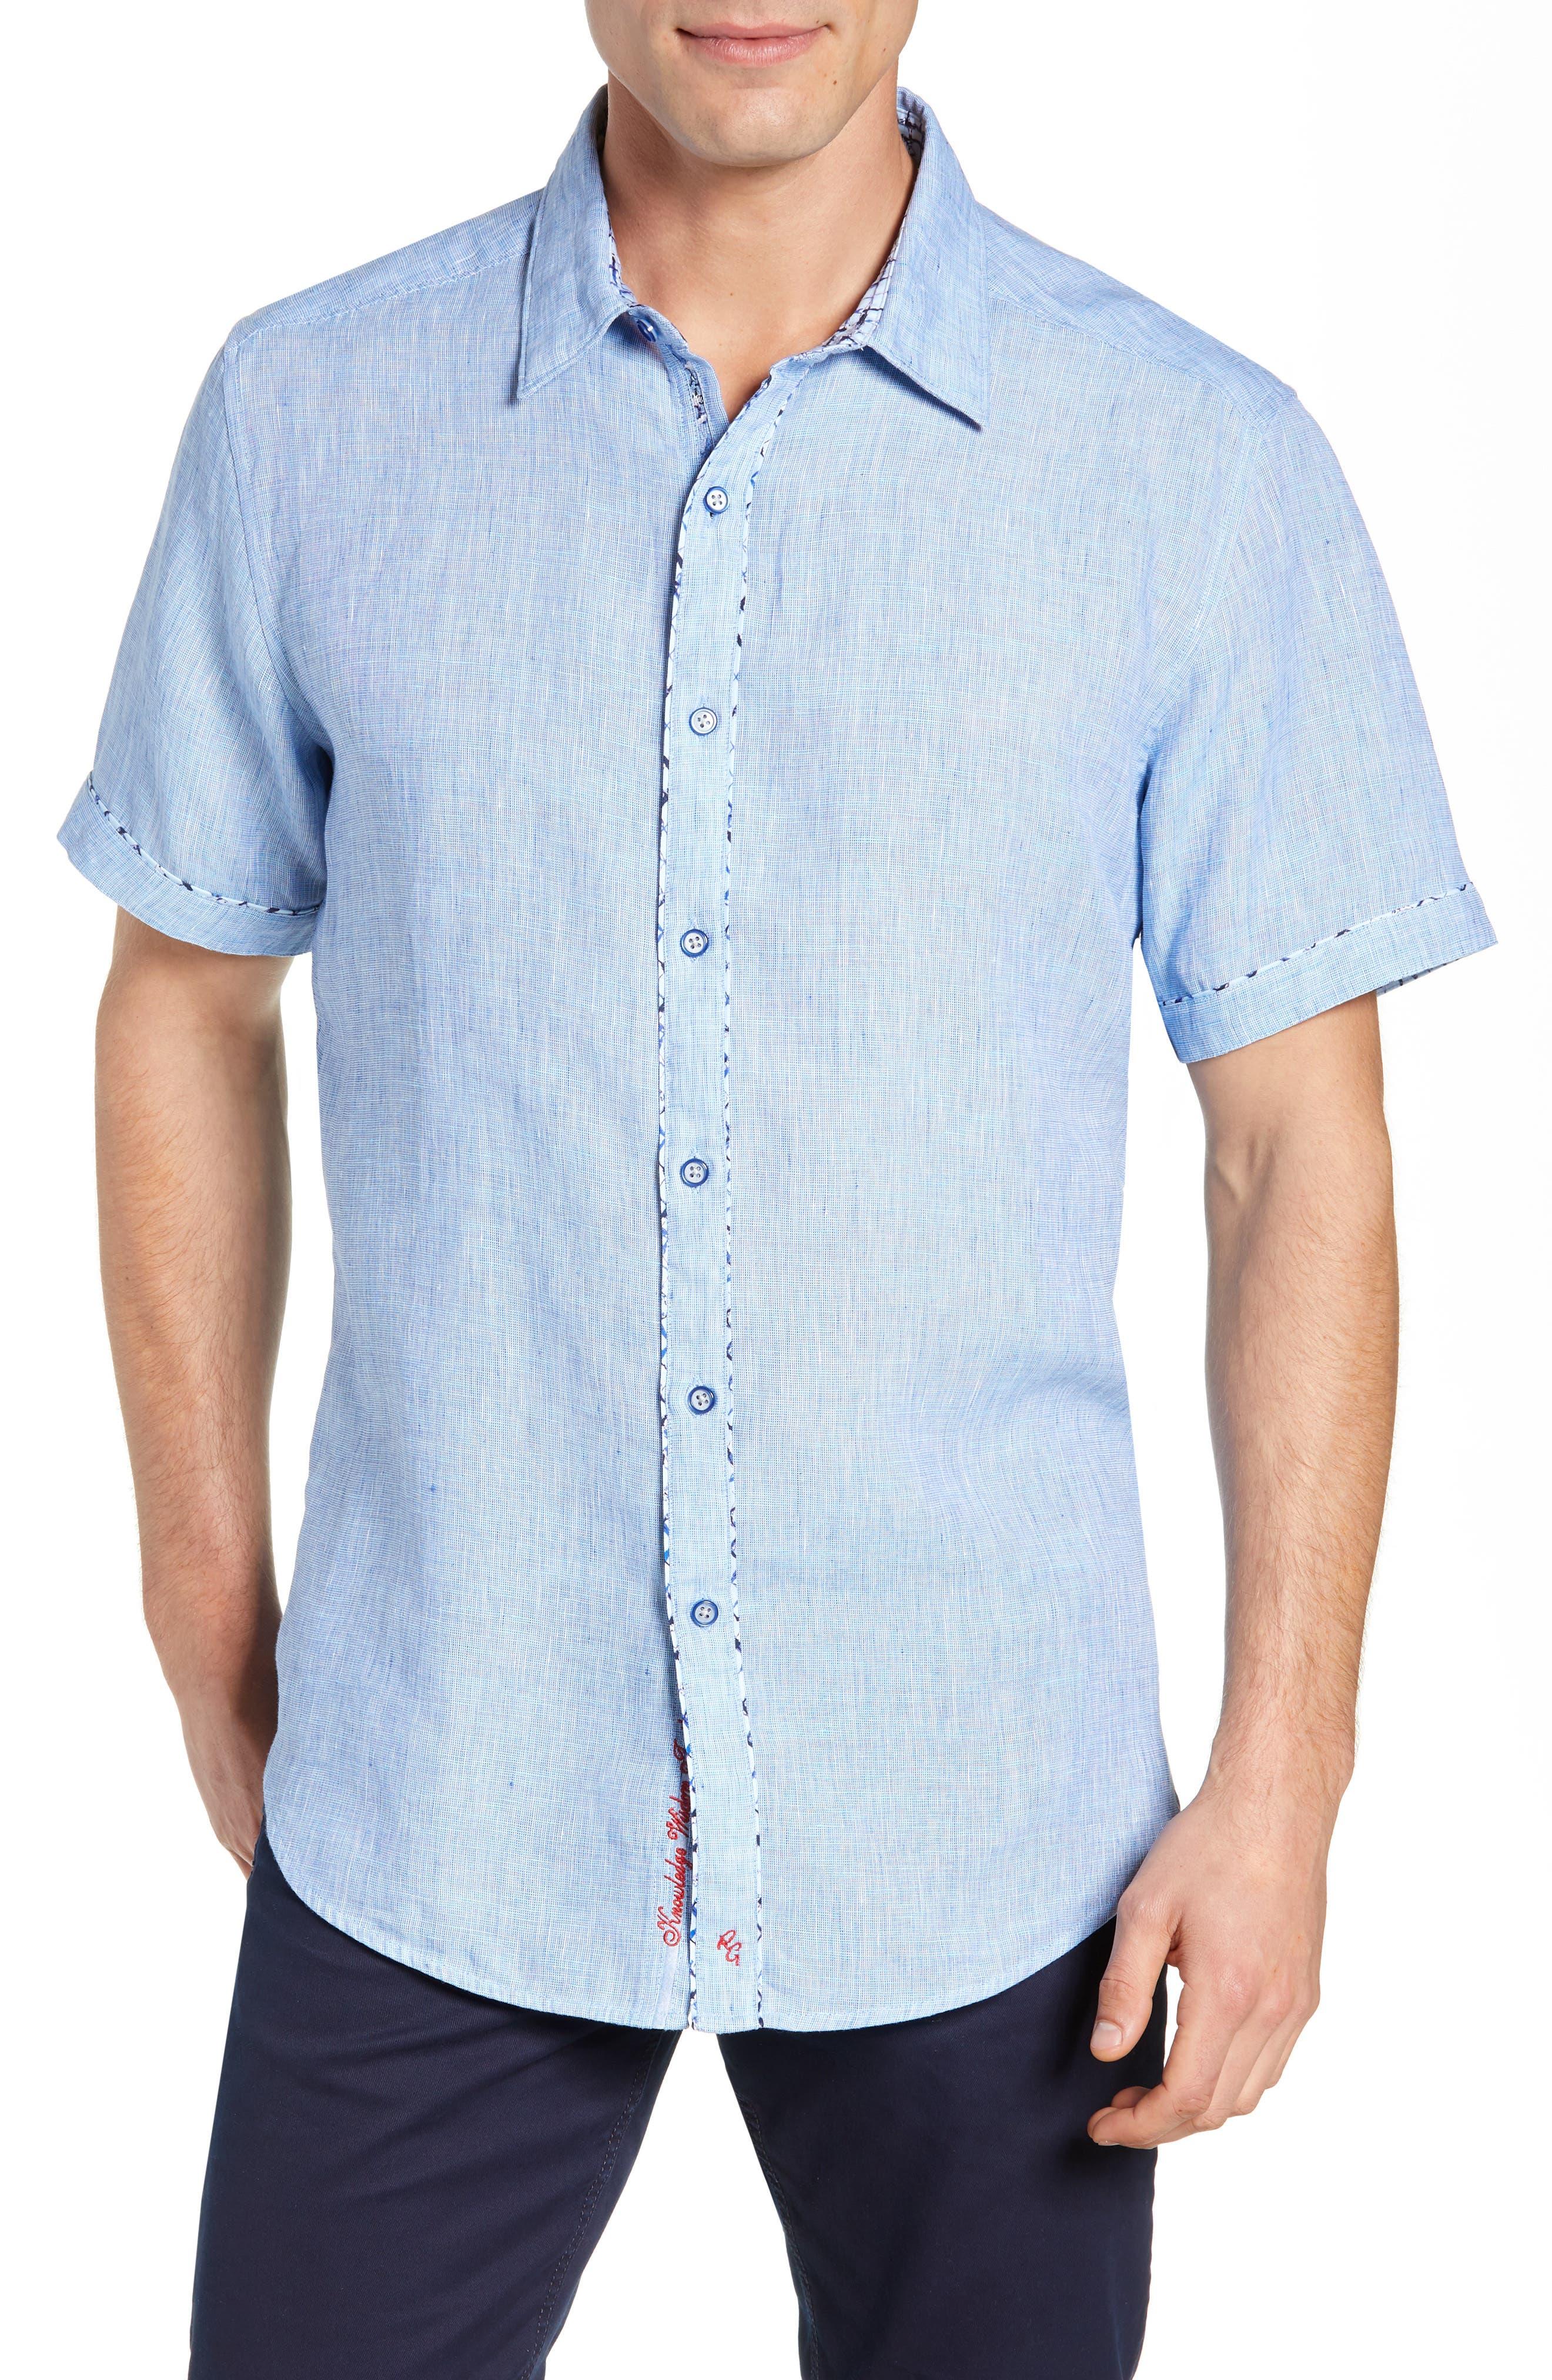 Gills Classic Fit Linen Sport Shirt,                             Main thumbnail 1, color,                             LIGHT BLUE